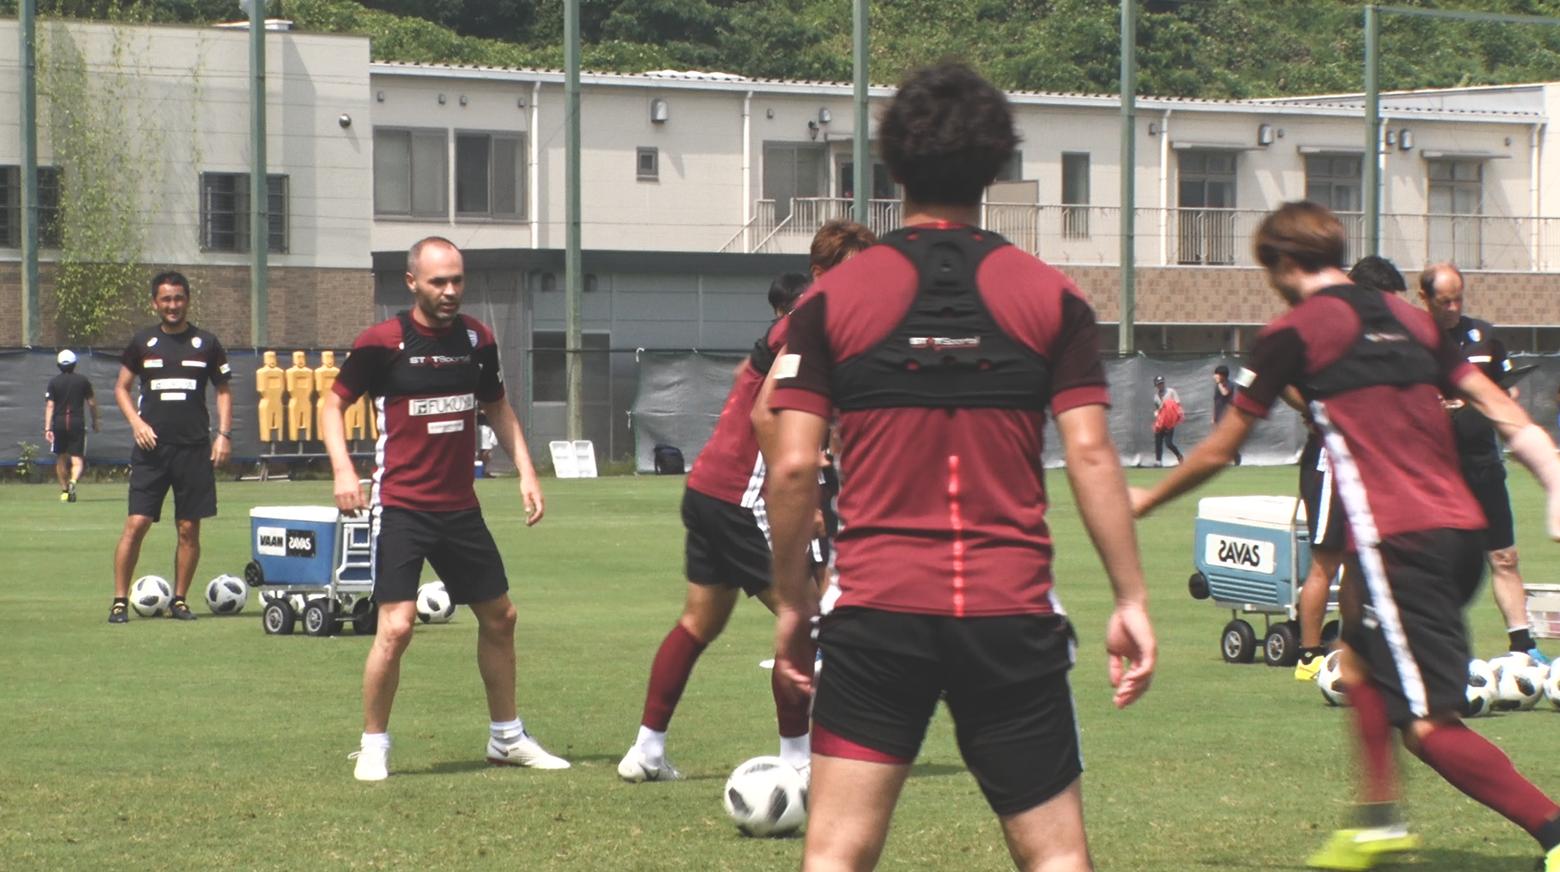 Iniesta TV Episode 13: Road to Kobe #11 First Team Practice 1